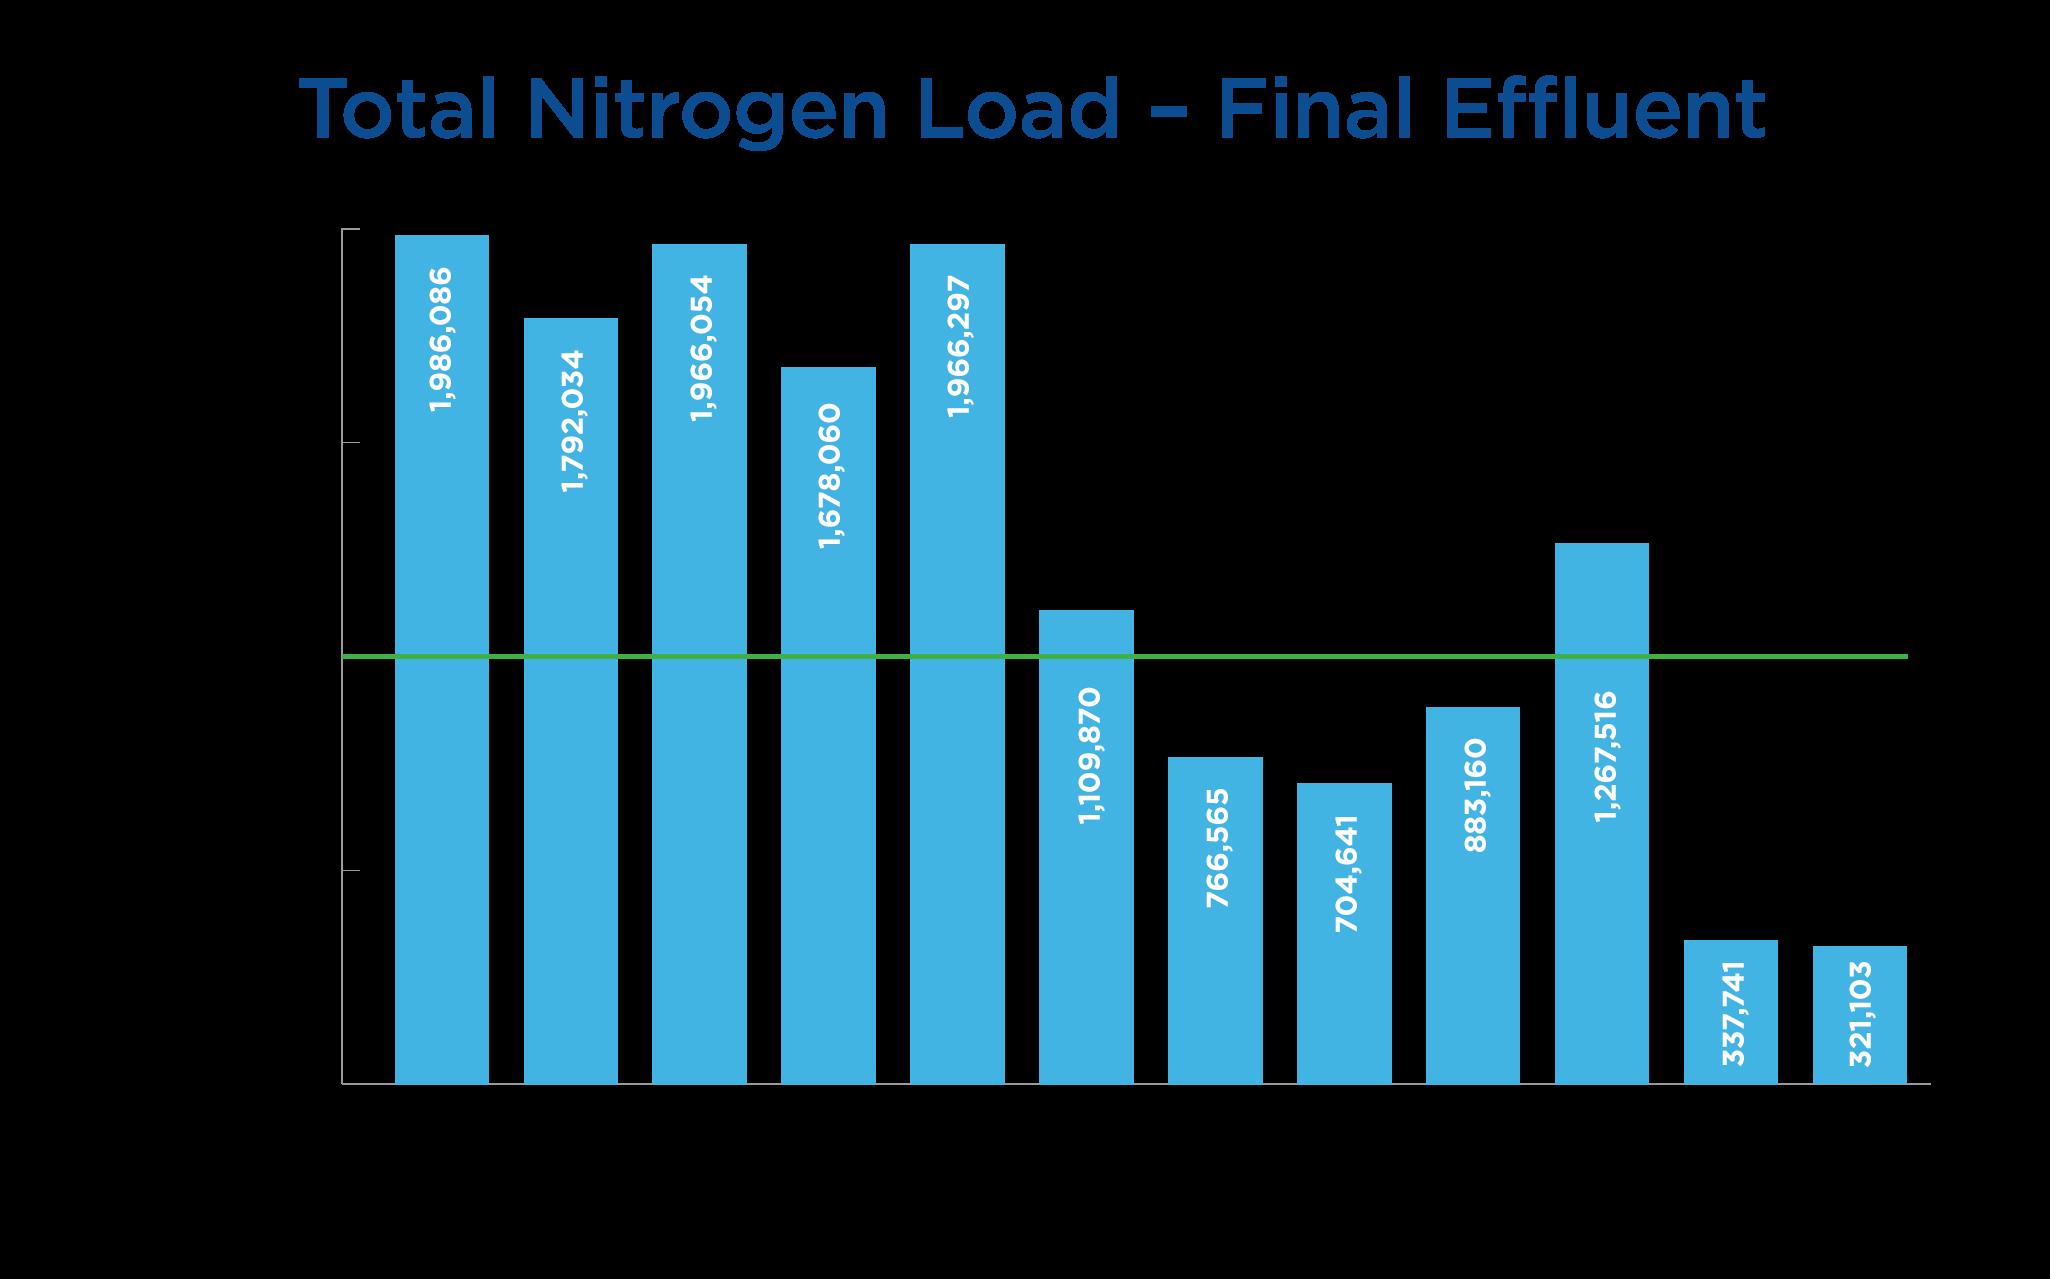 Annual-Total-Nitrogen-Discharge.jpg